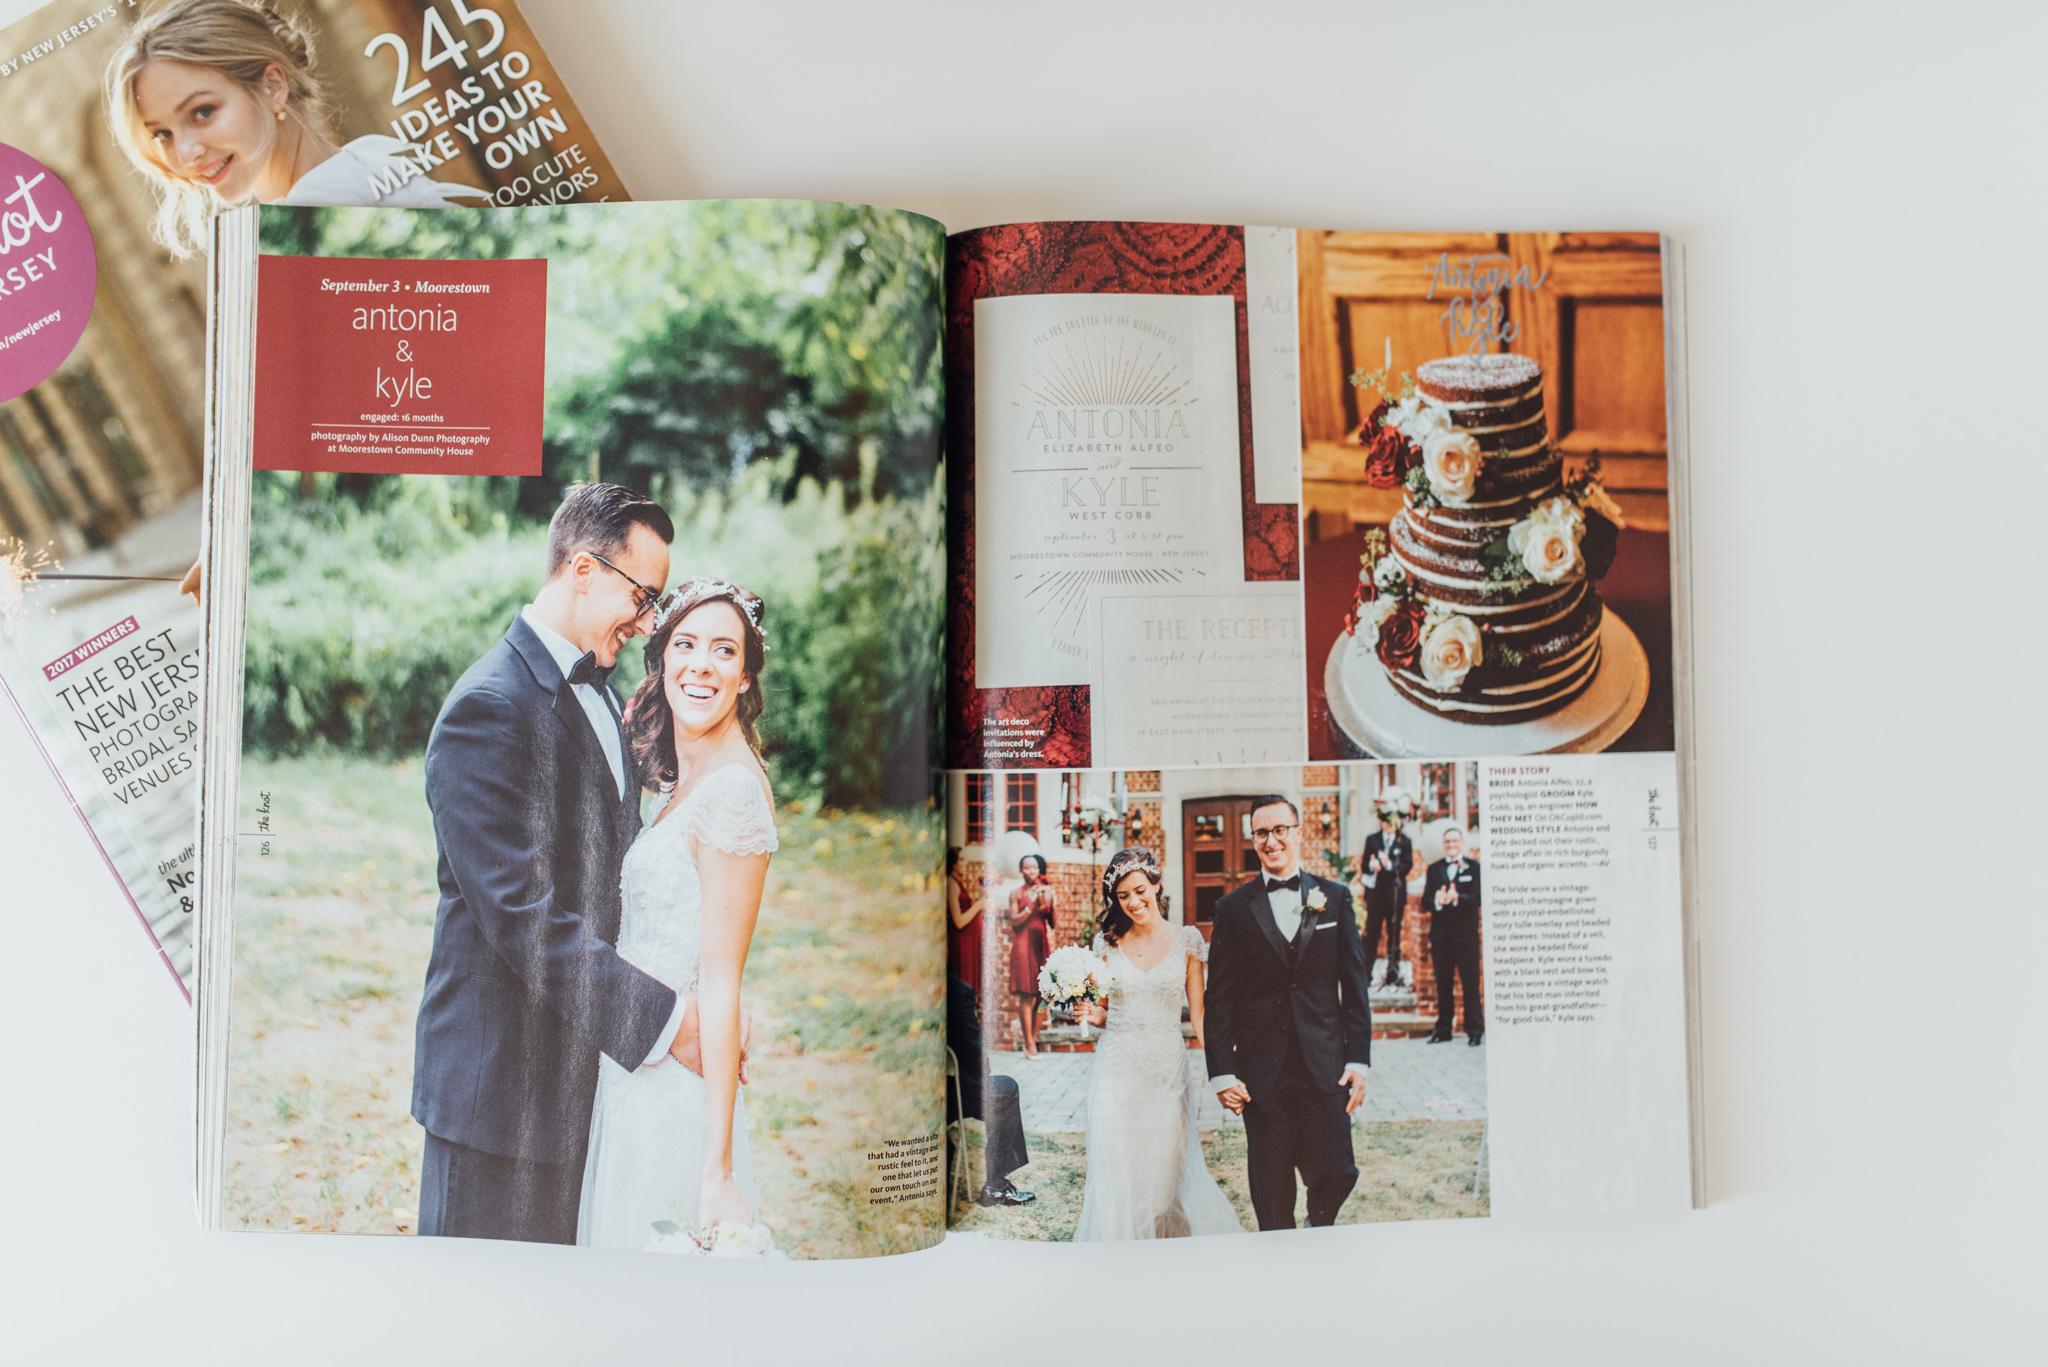 Antonia & Kyle's Wedding - Lydia Marie Elizabeth